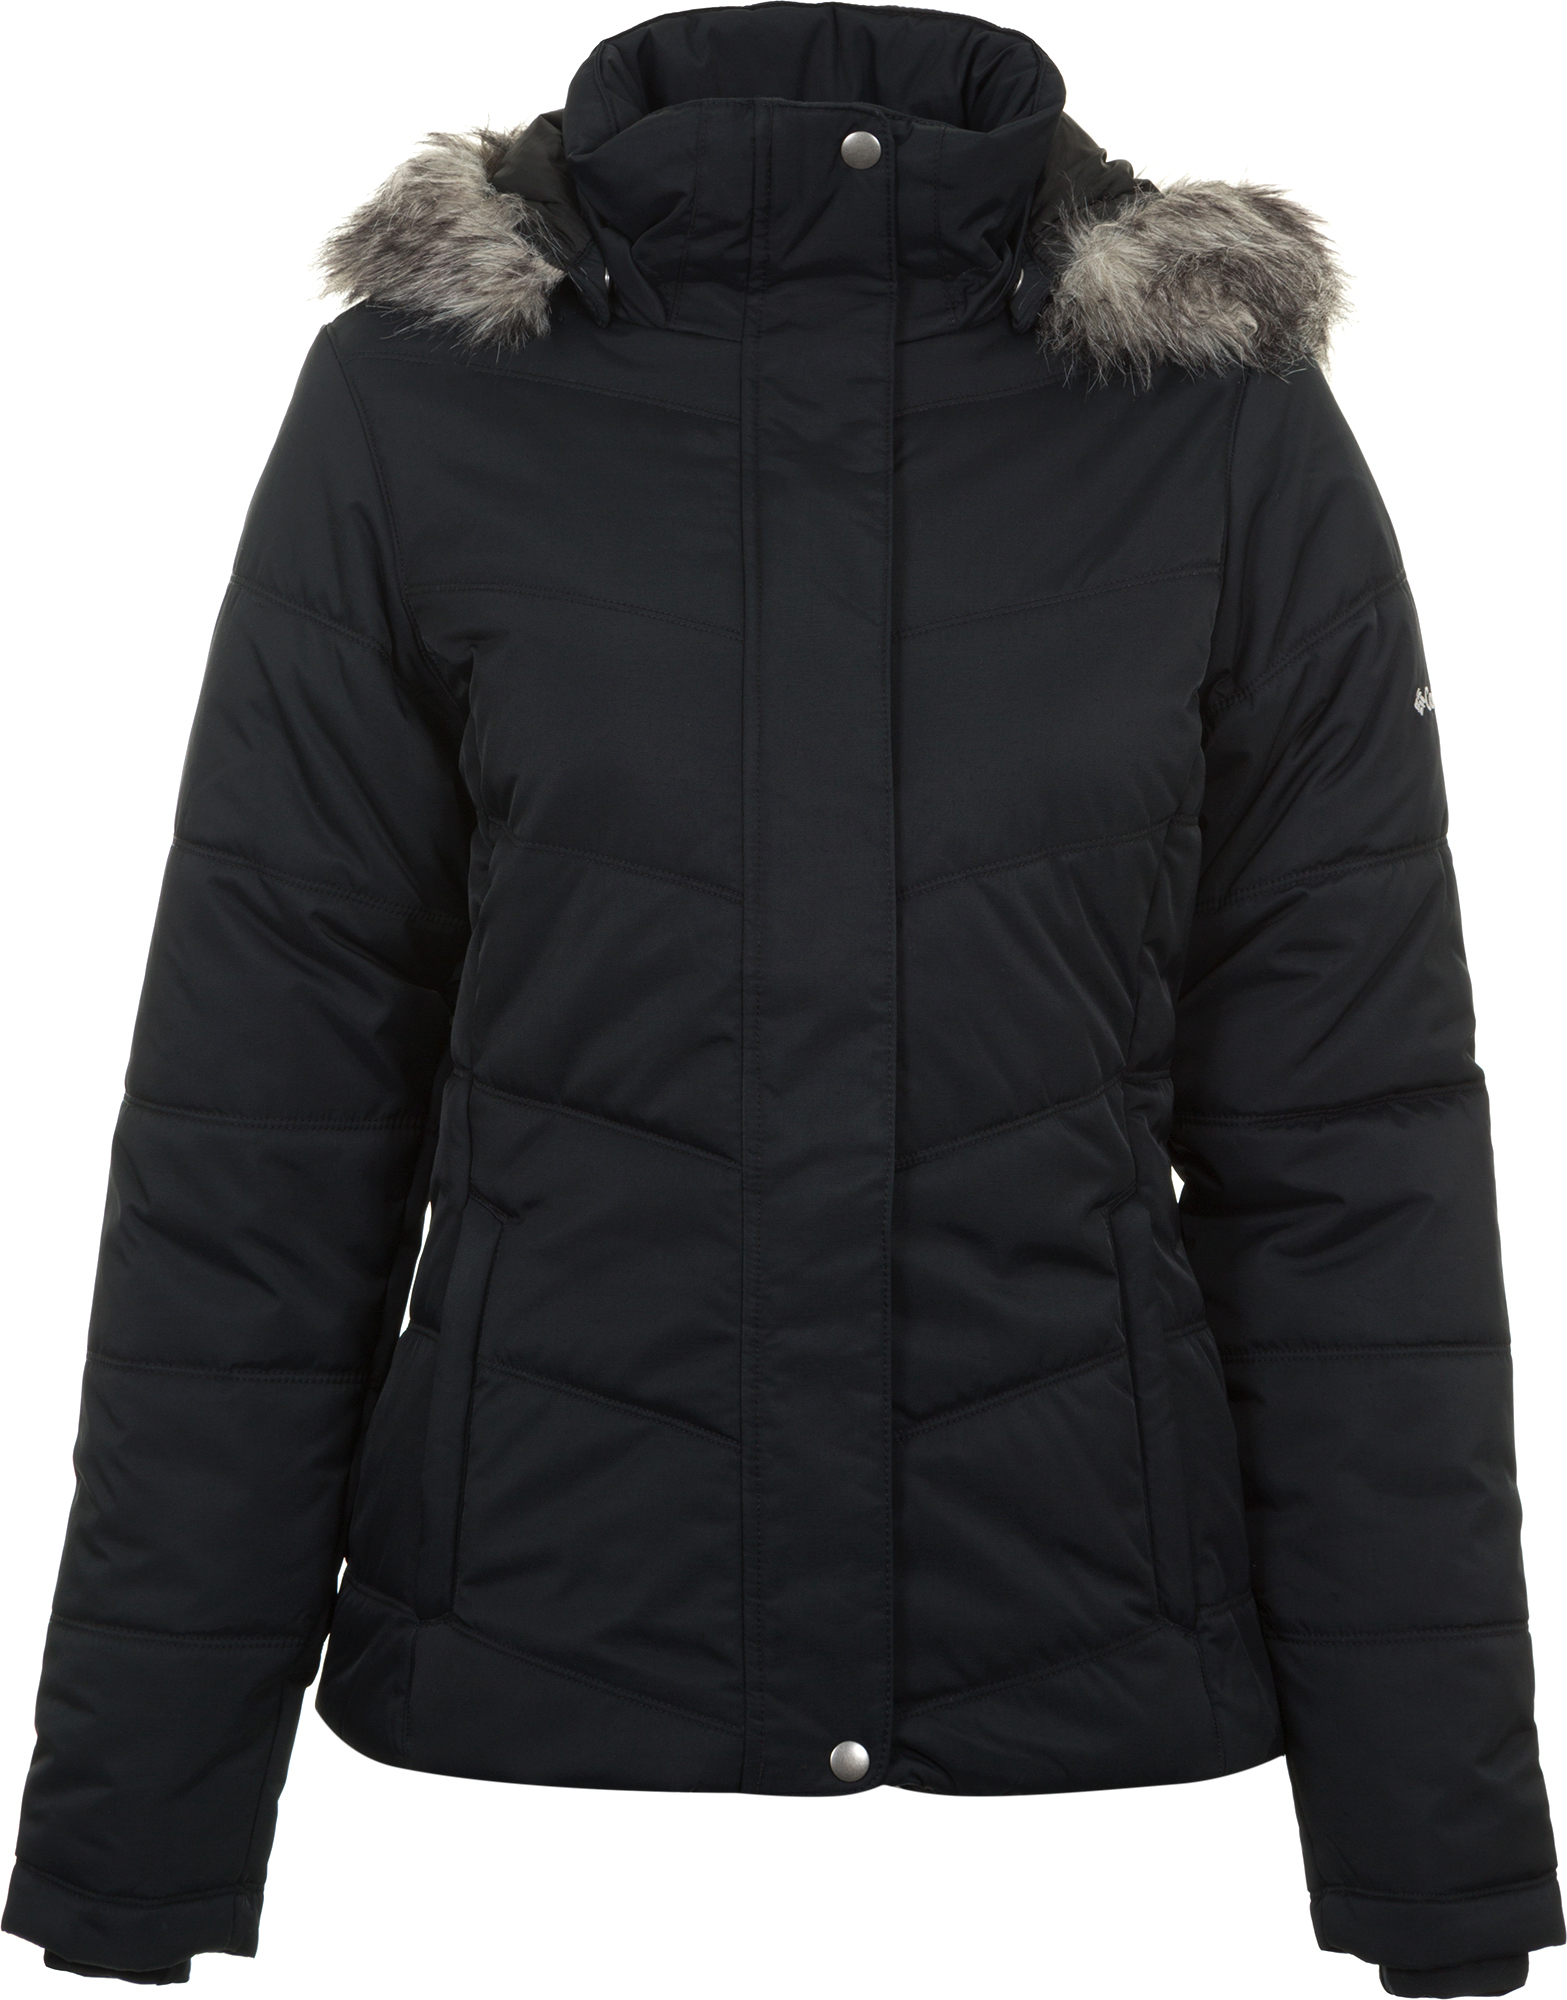 Columbia Куртка утепленная женская Columbia Deerpoint, размер 50